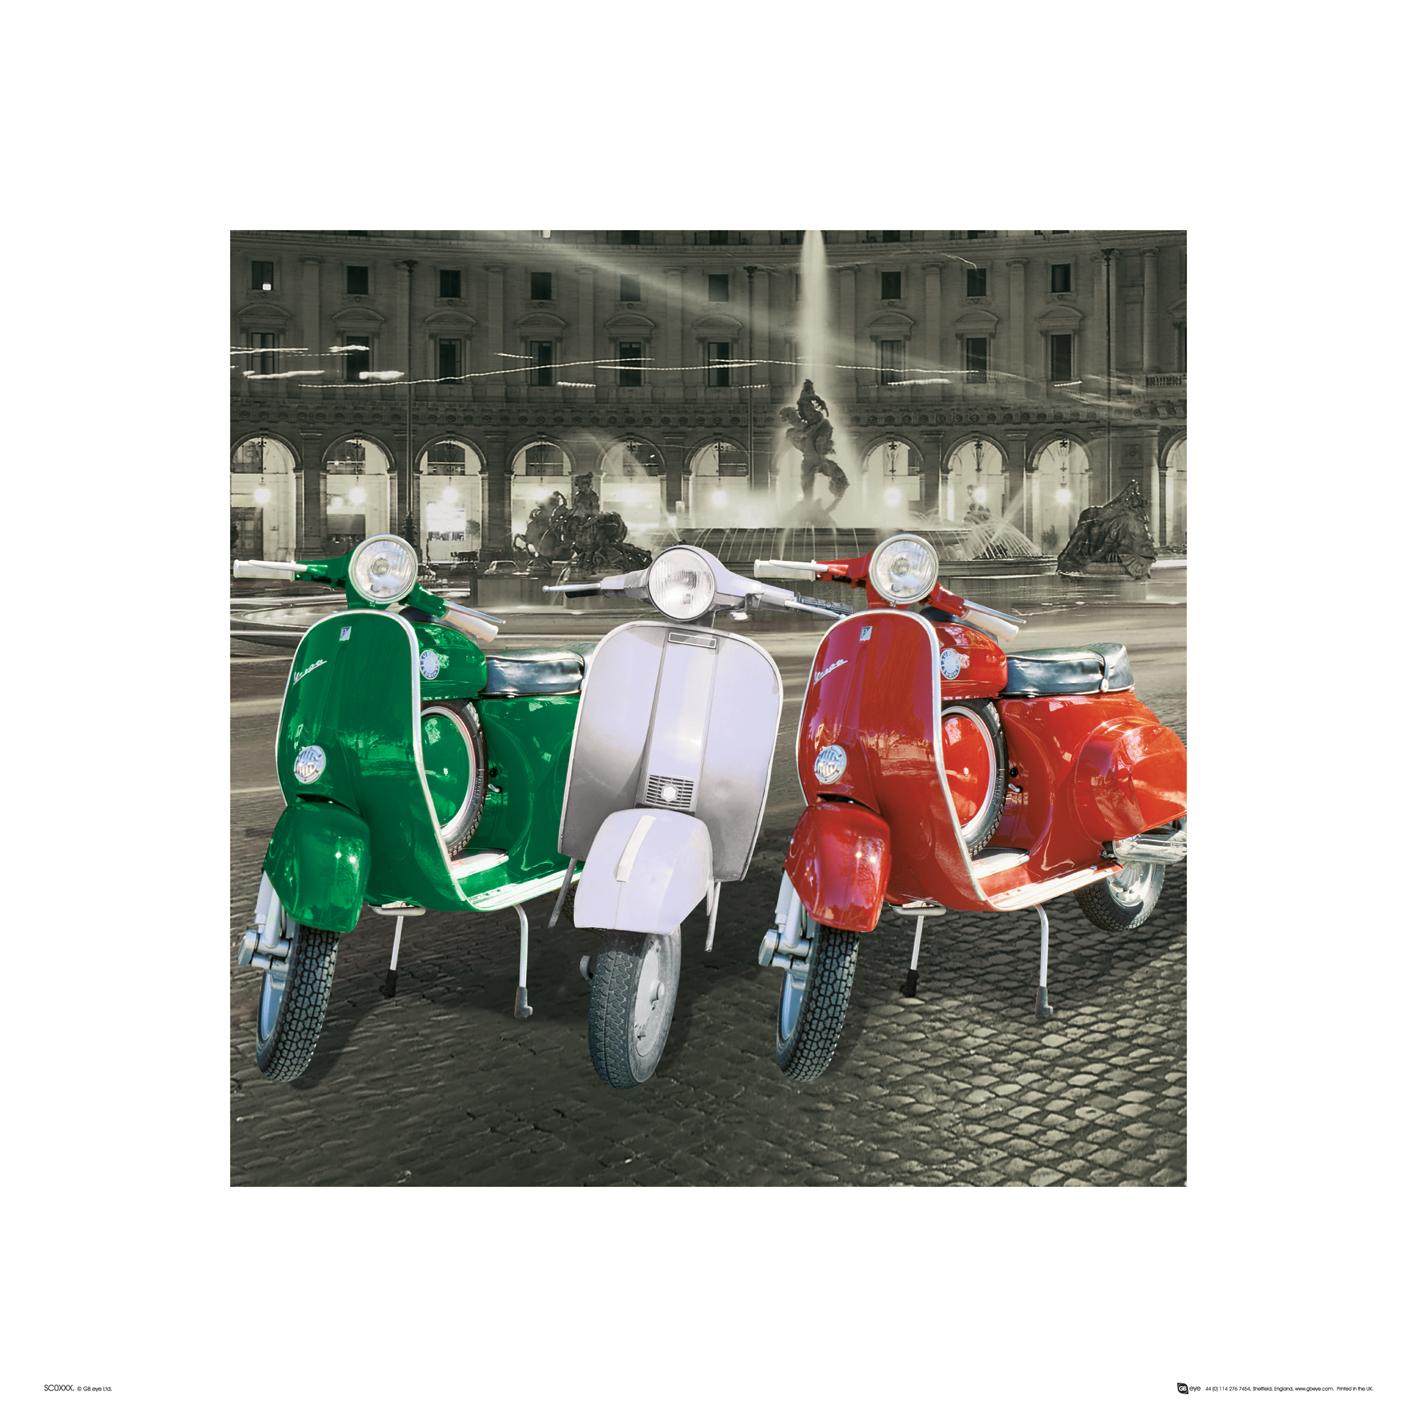 Italien vespas italien flagge kunstdruck rahmen mdf in for Vespa com italia